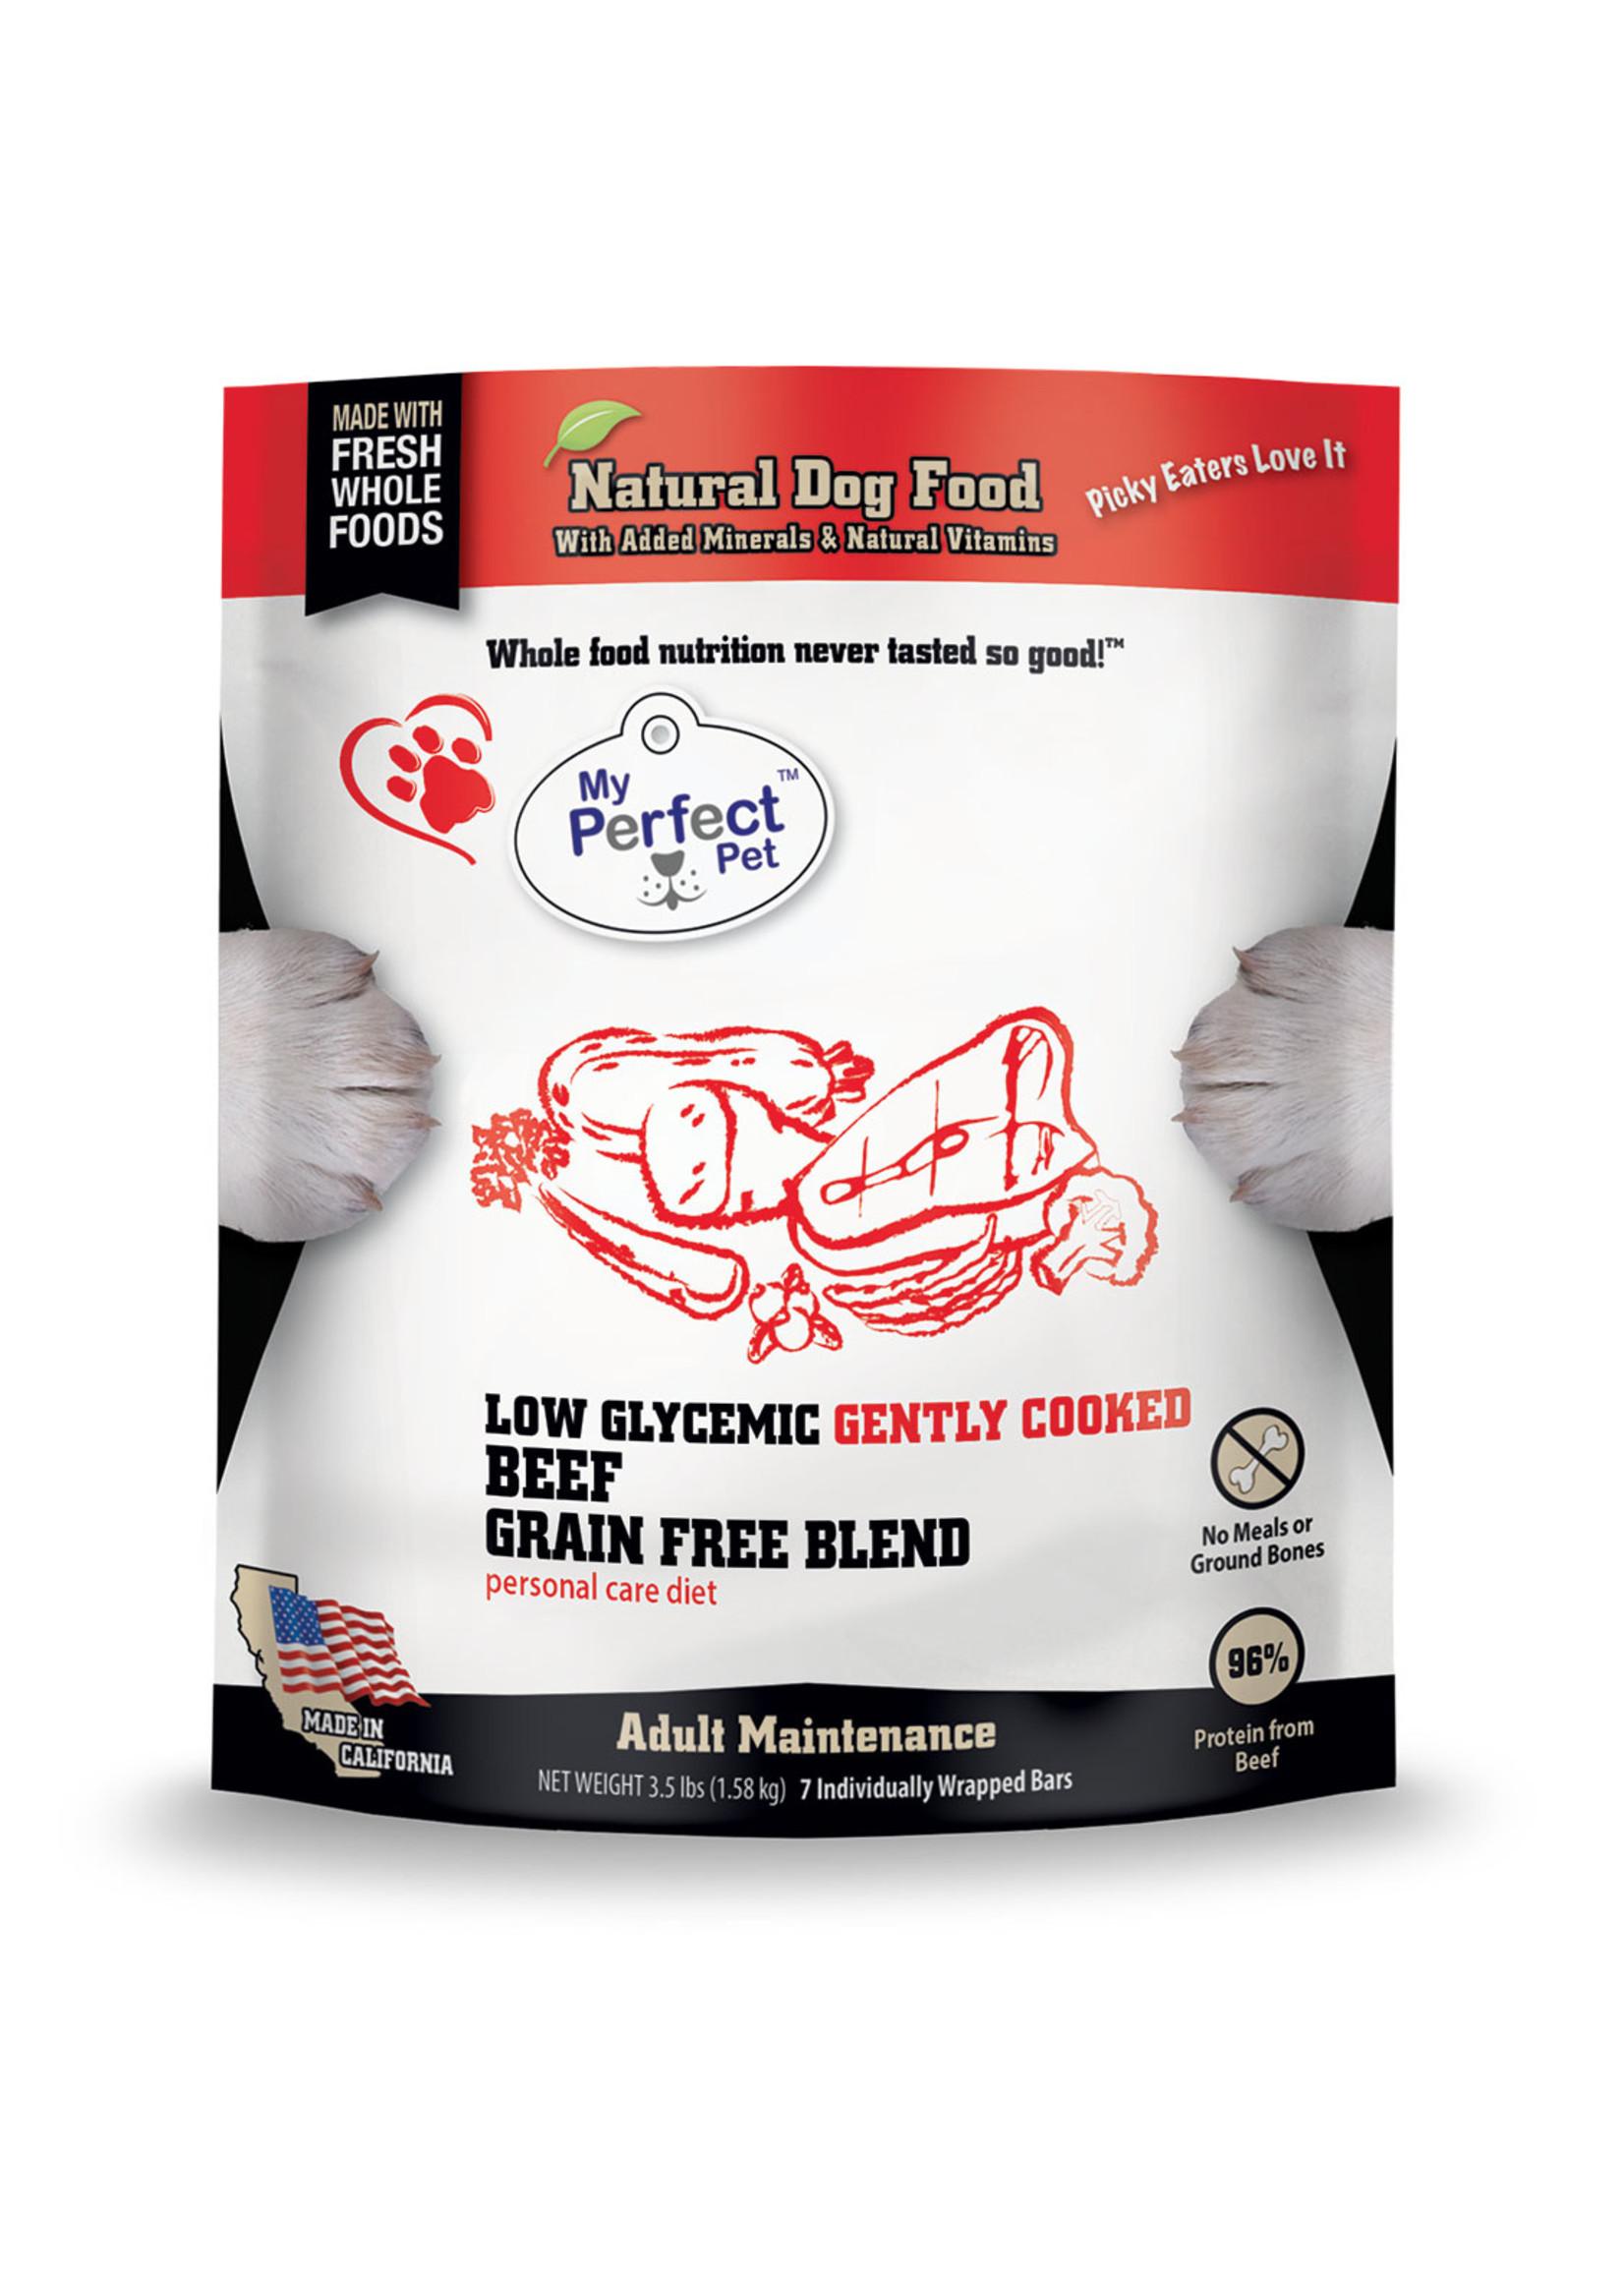 MY PERFECT PET Potato-free, Grain-free Beef Blend (Low Glycemic Beef Blend)